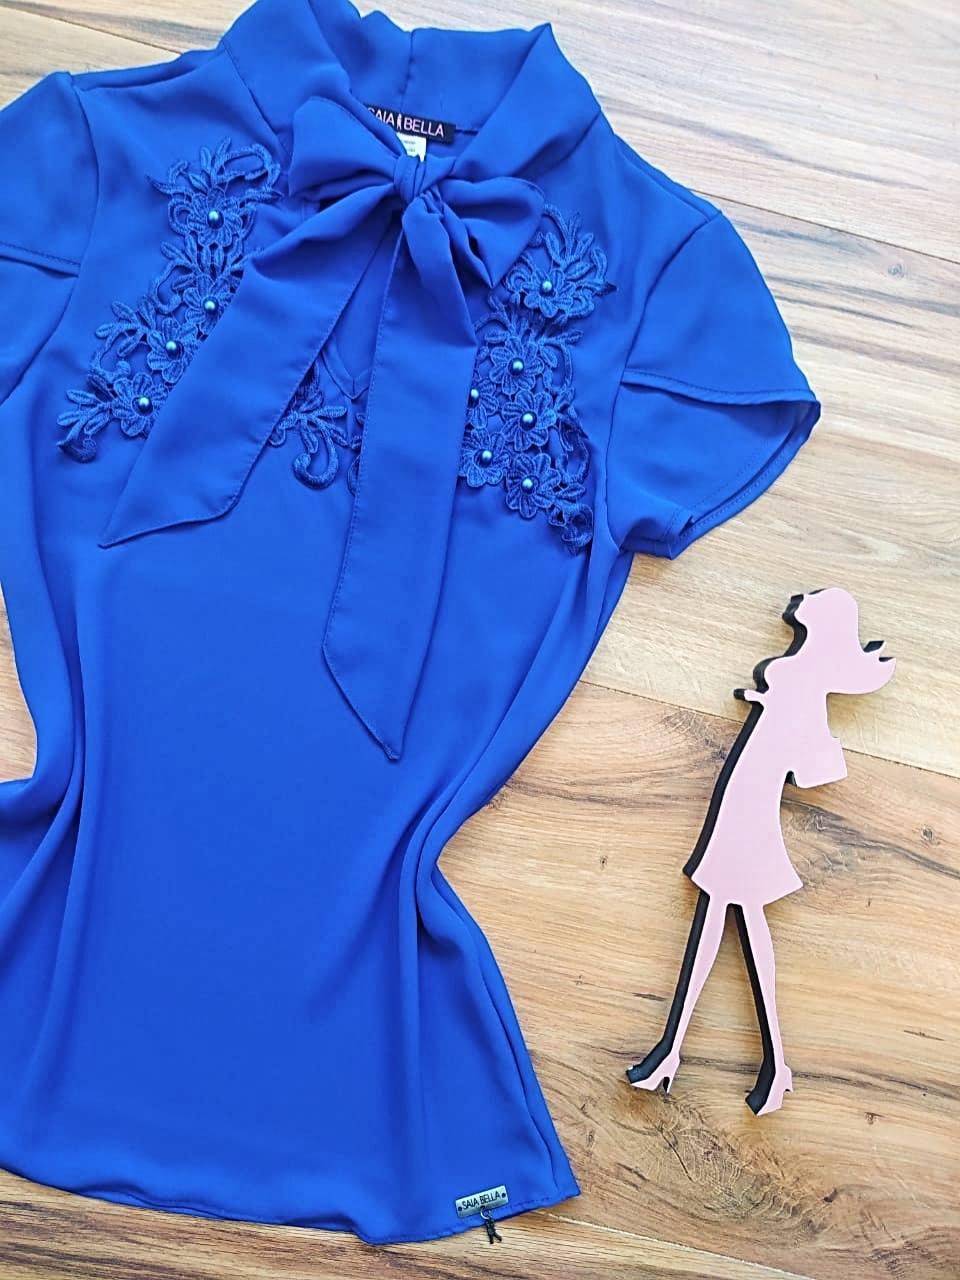 Blusa Luma Saia Bella - SB3312 Azul Royal